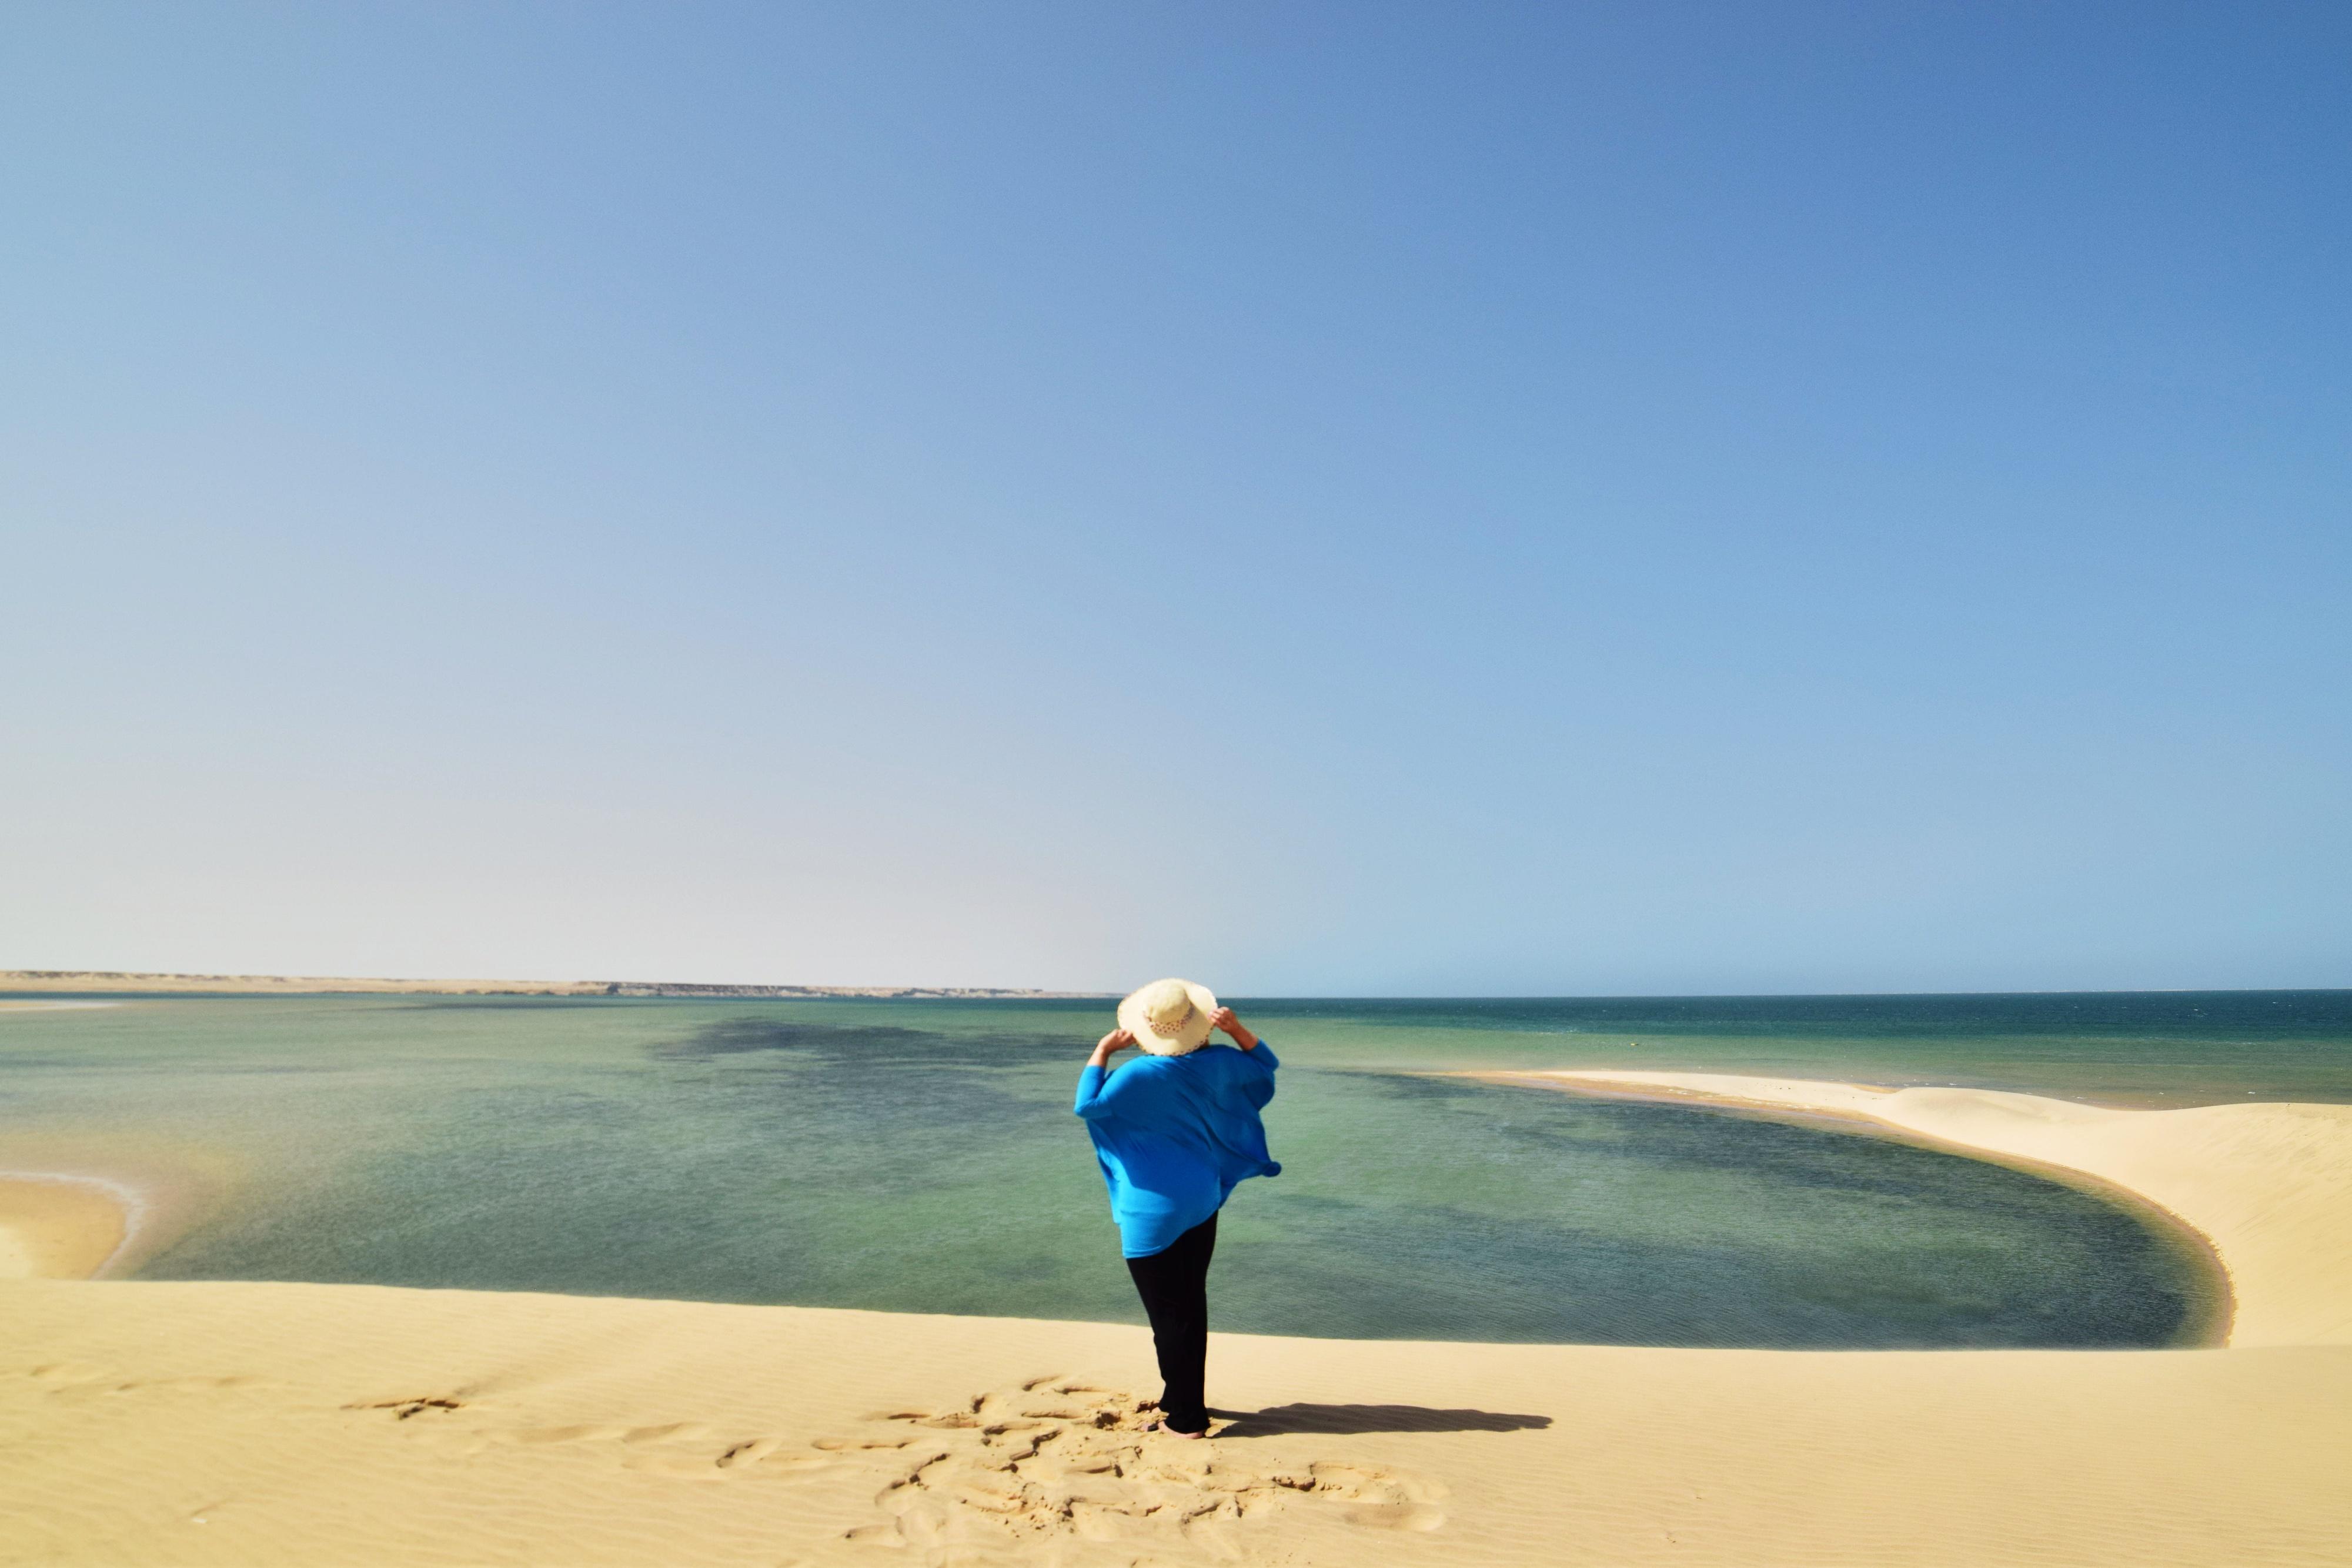 lagoon, dakhla, white, dune, dunes, sandstorn, surreal, destination, morocco, sahara, ocean, surf, kite, camp,